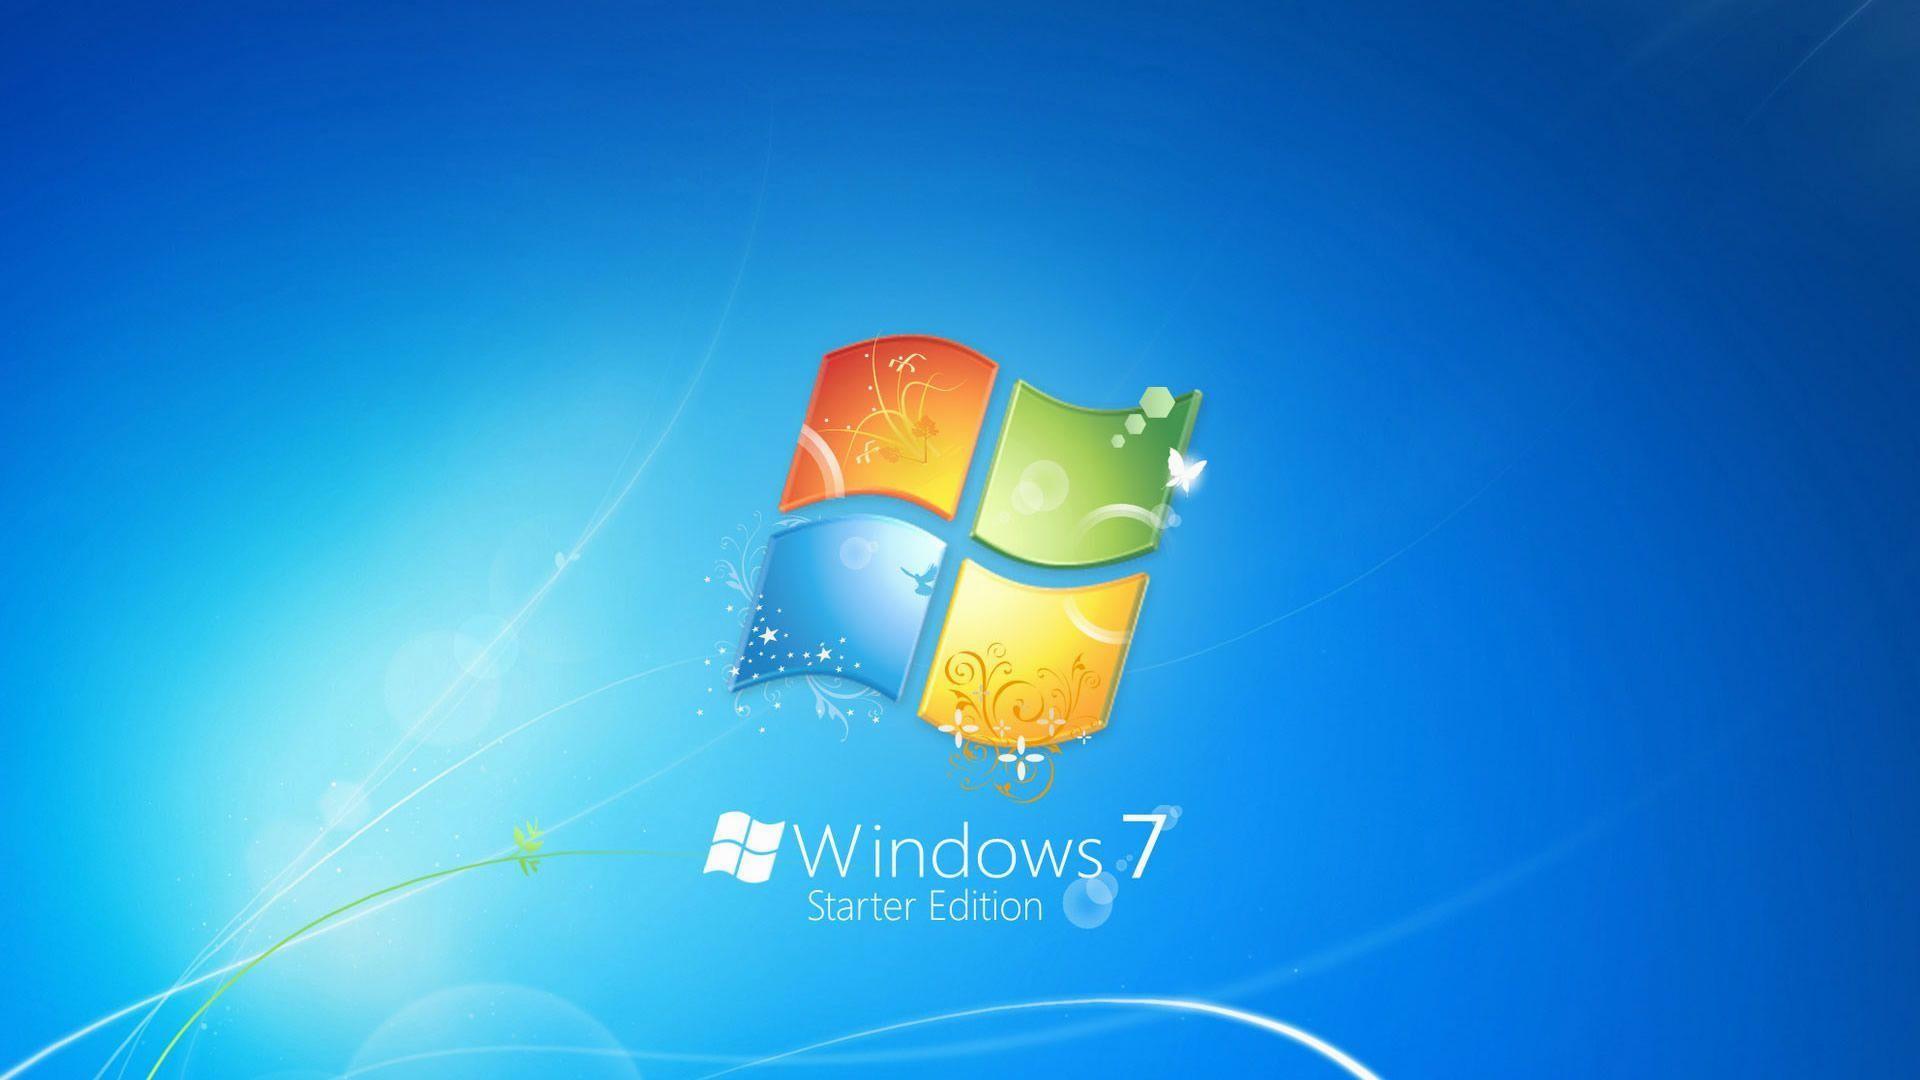 Windows 7 Background Desktop 62 images 1920x1080